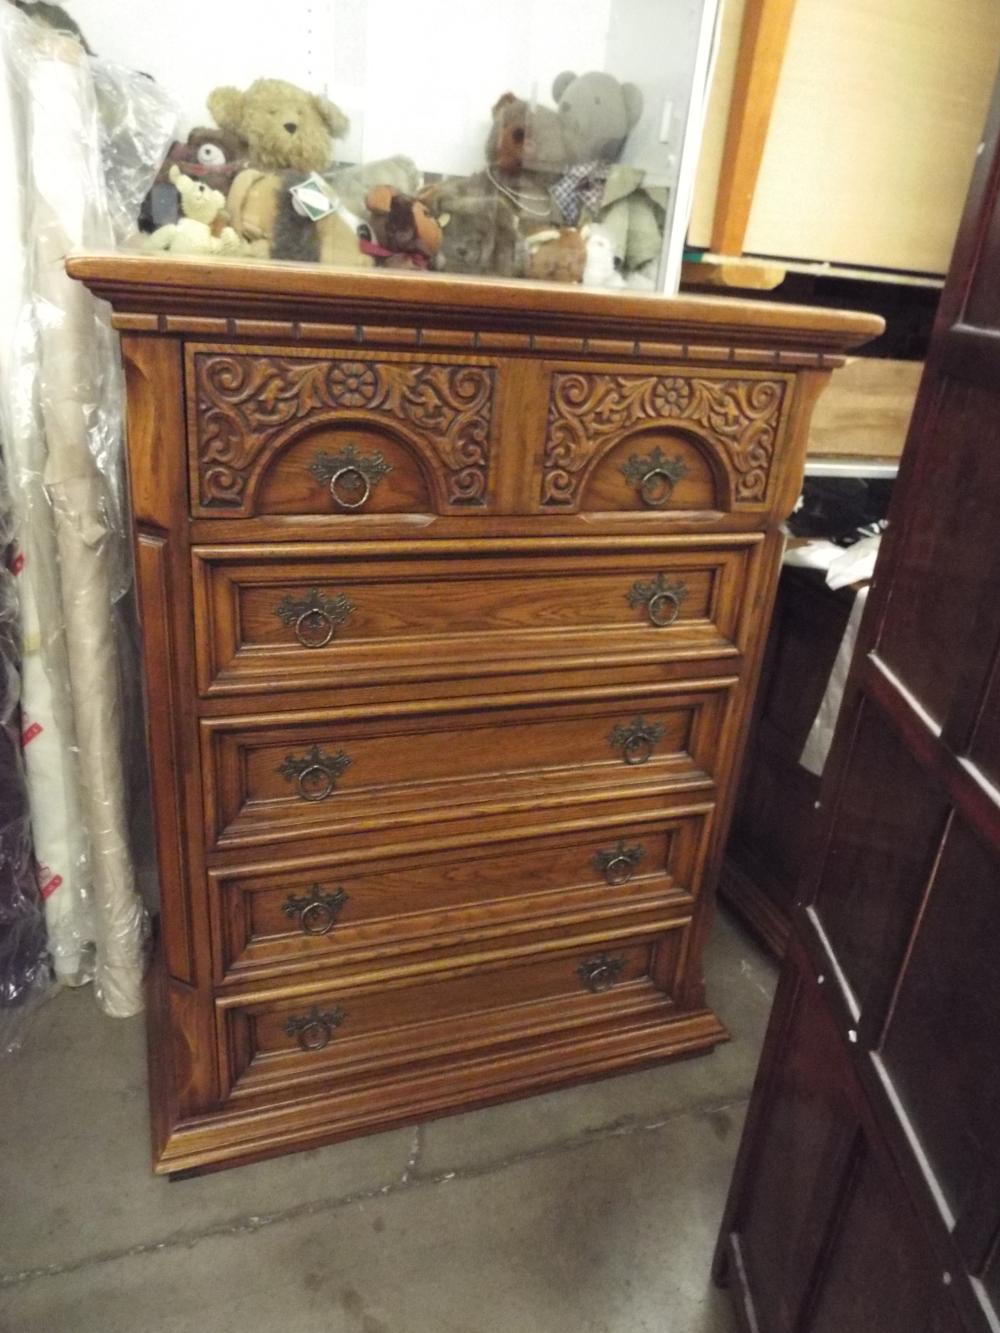 Link Taylor Furniture : taylor, furniture, Price:, Vintage, Taylor, Chest, Drawers, Invalid